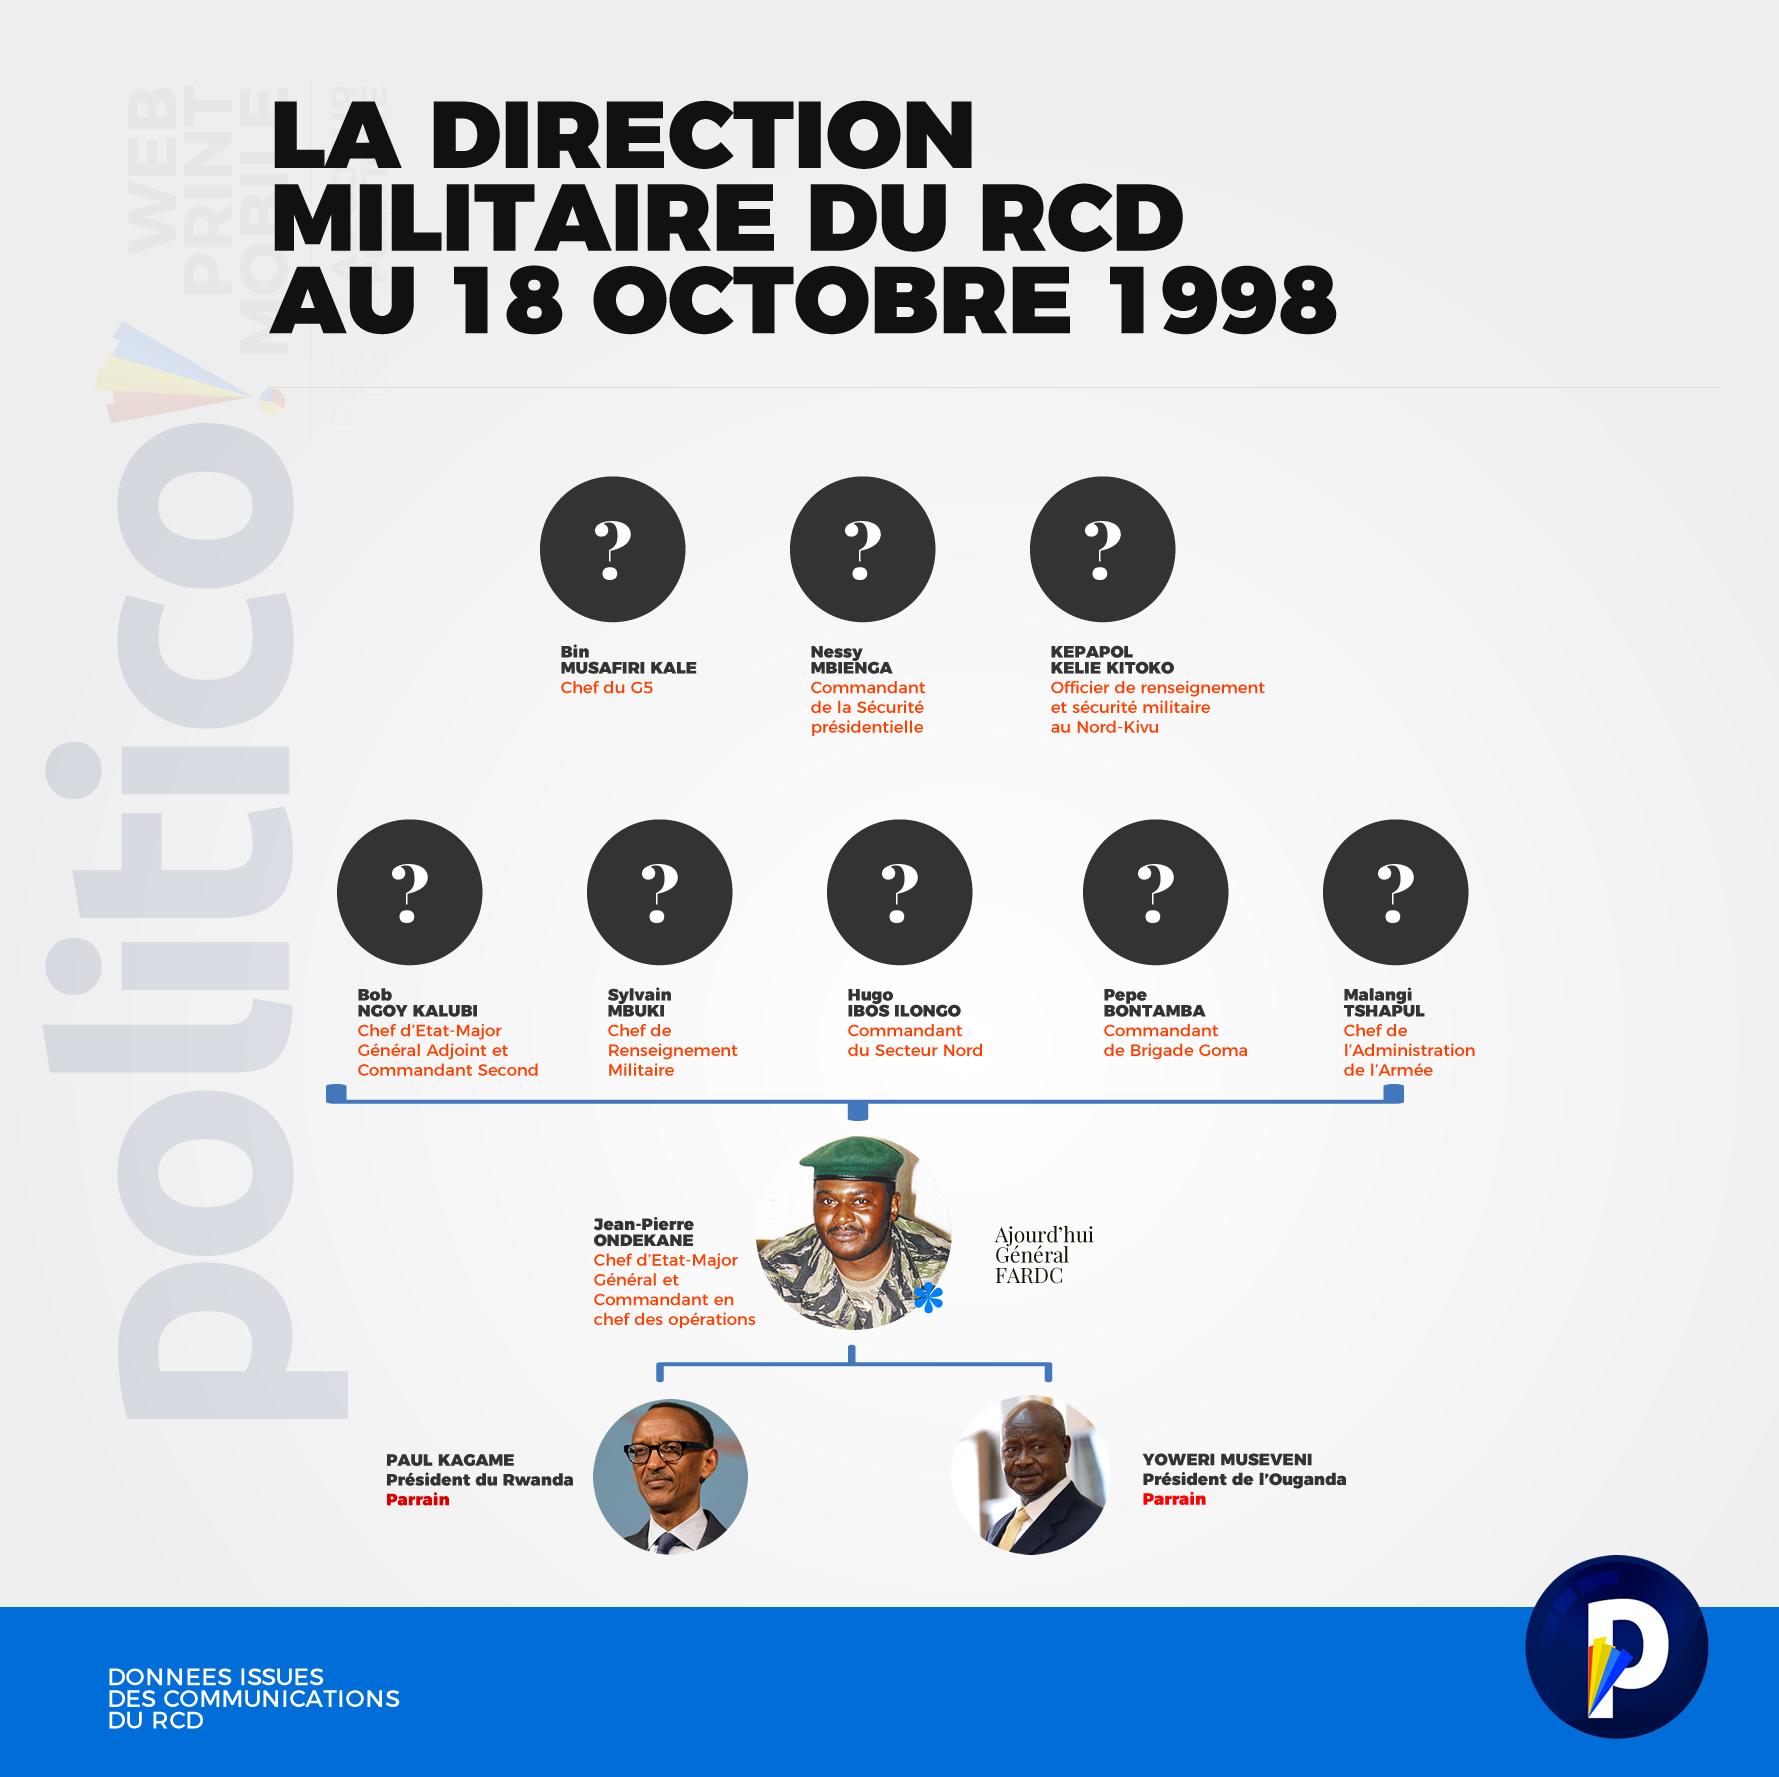 18 octobre 1998: le crime collectif de Kindu